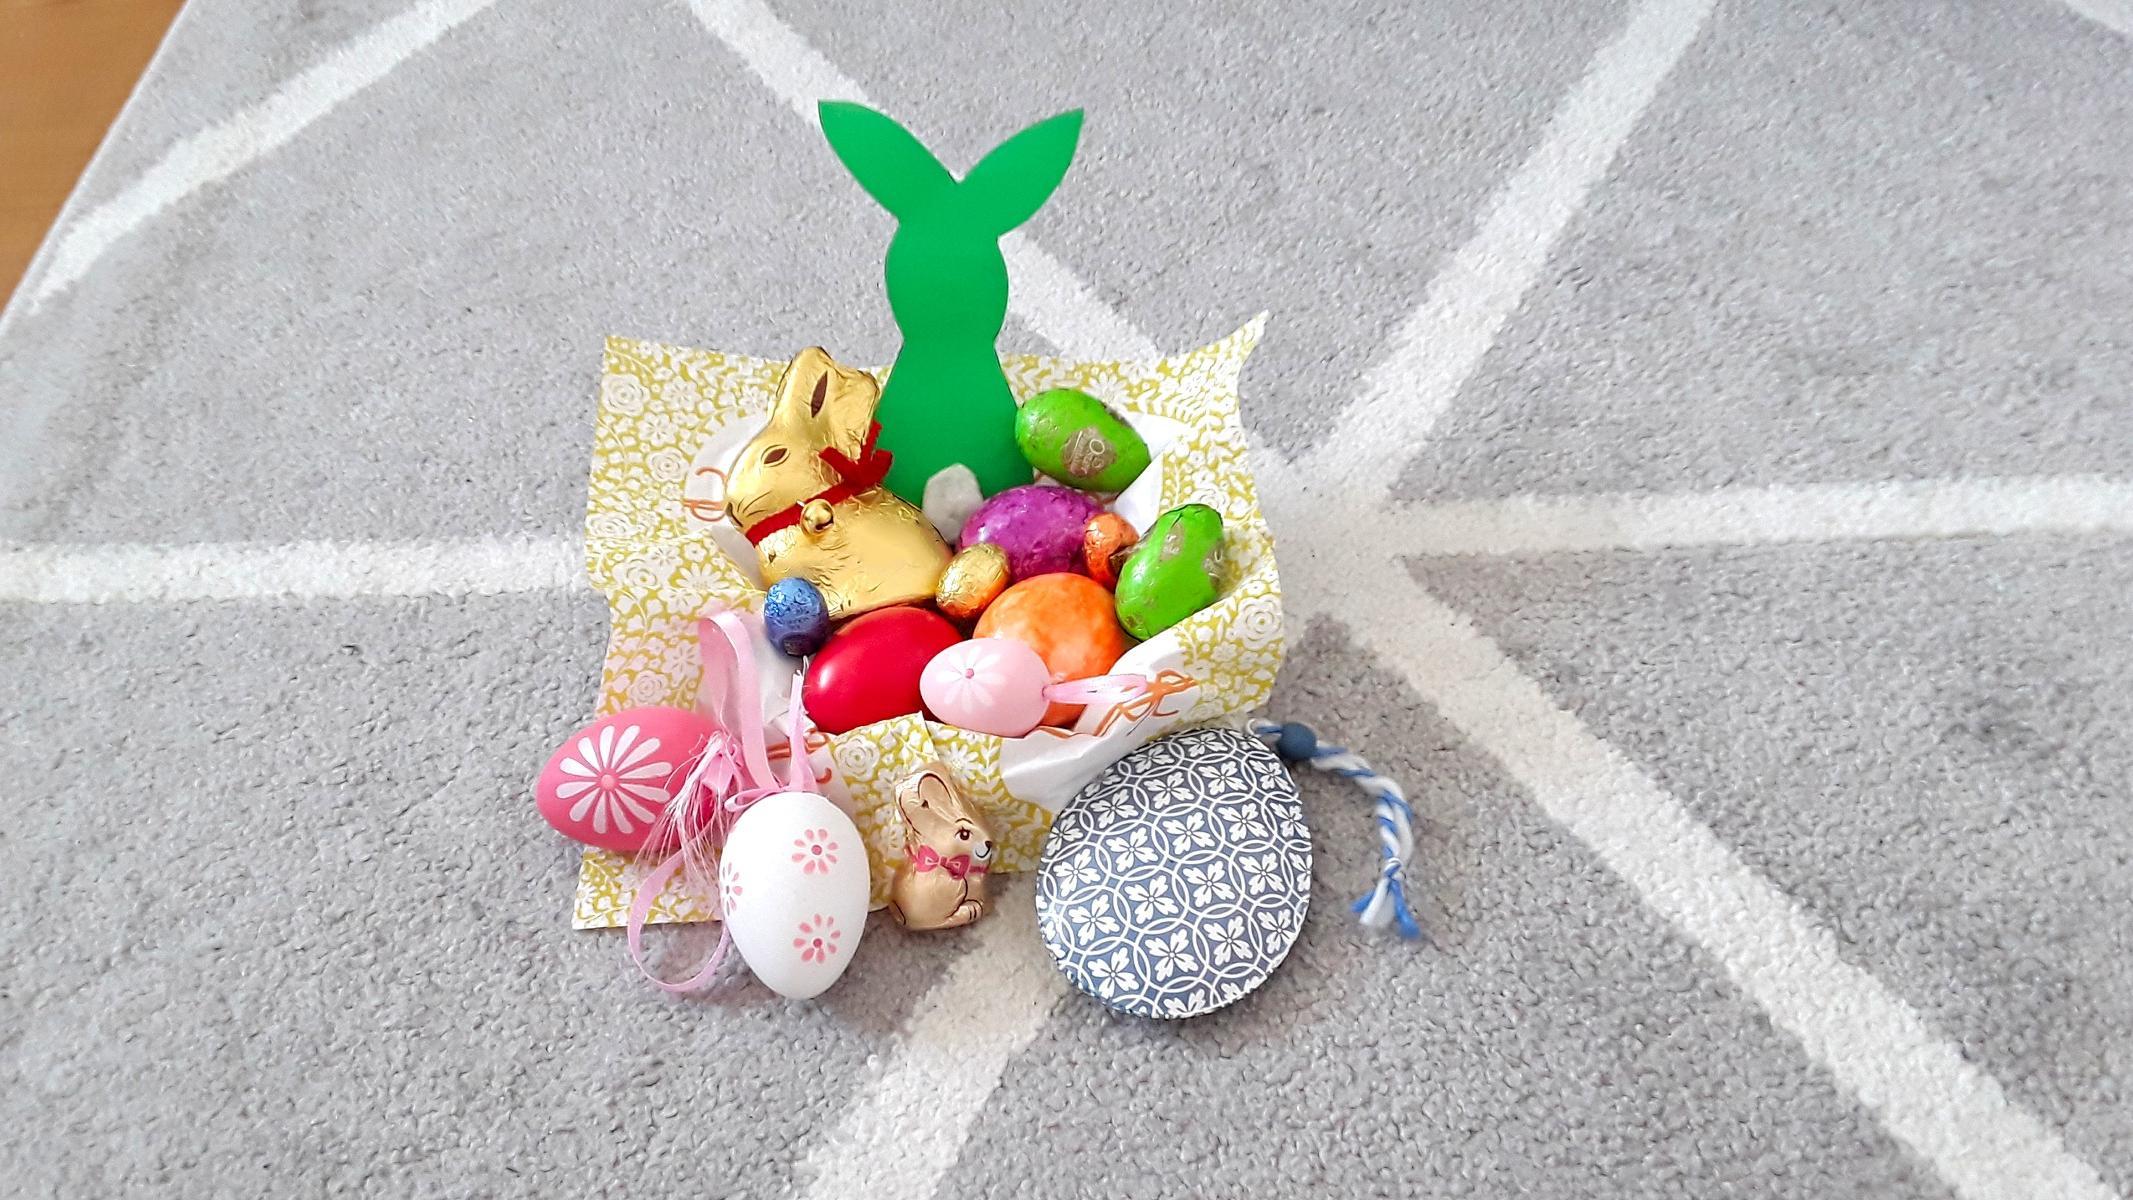 Osterkörbchen zu Ostern selbst basteln.